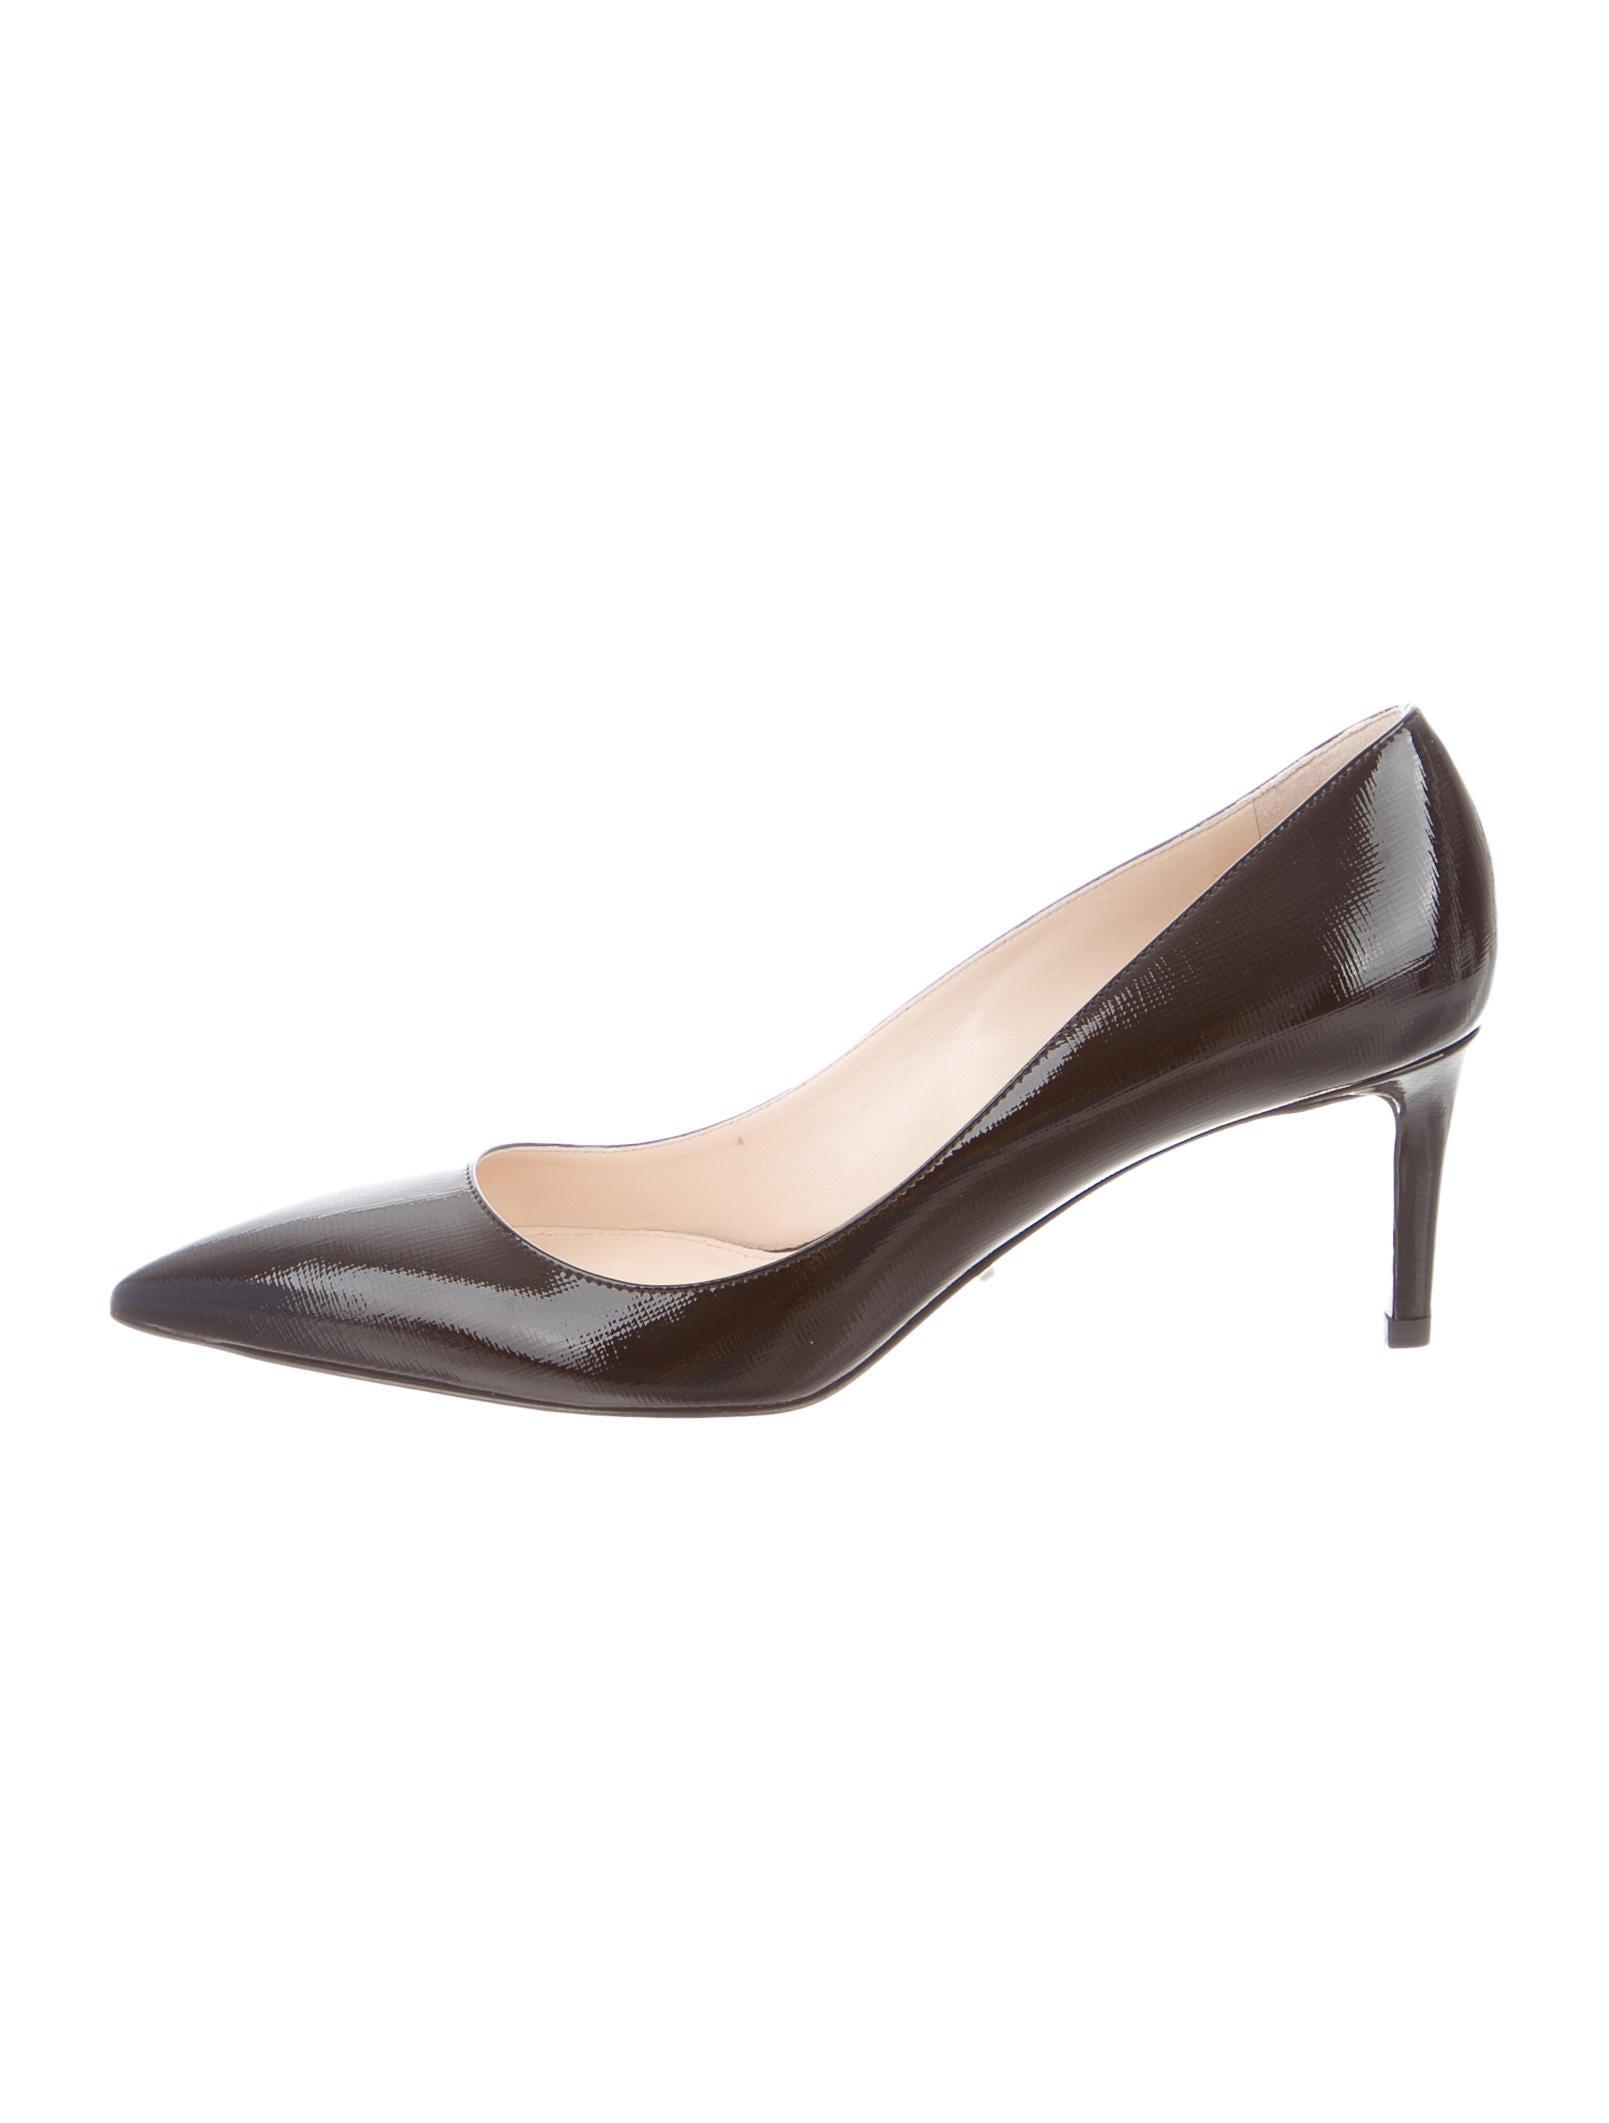 4e4466f7b90d Prada Saffiano Leather Pointed-Toe Pumps w  Tags - Shoes - PRA96441 ...